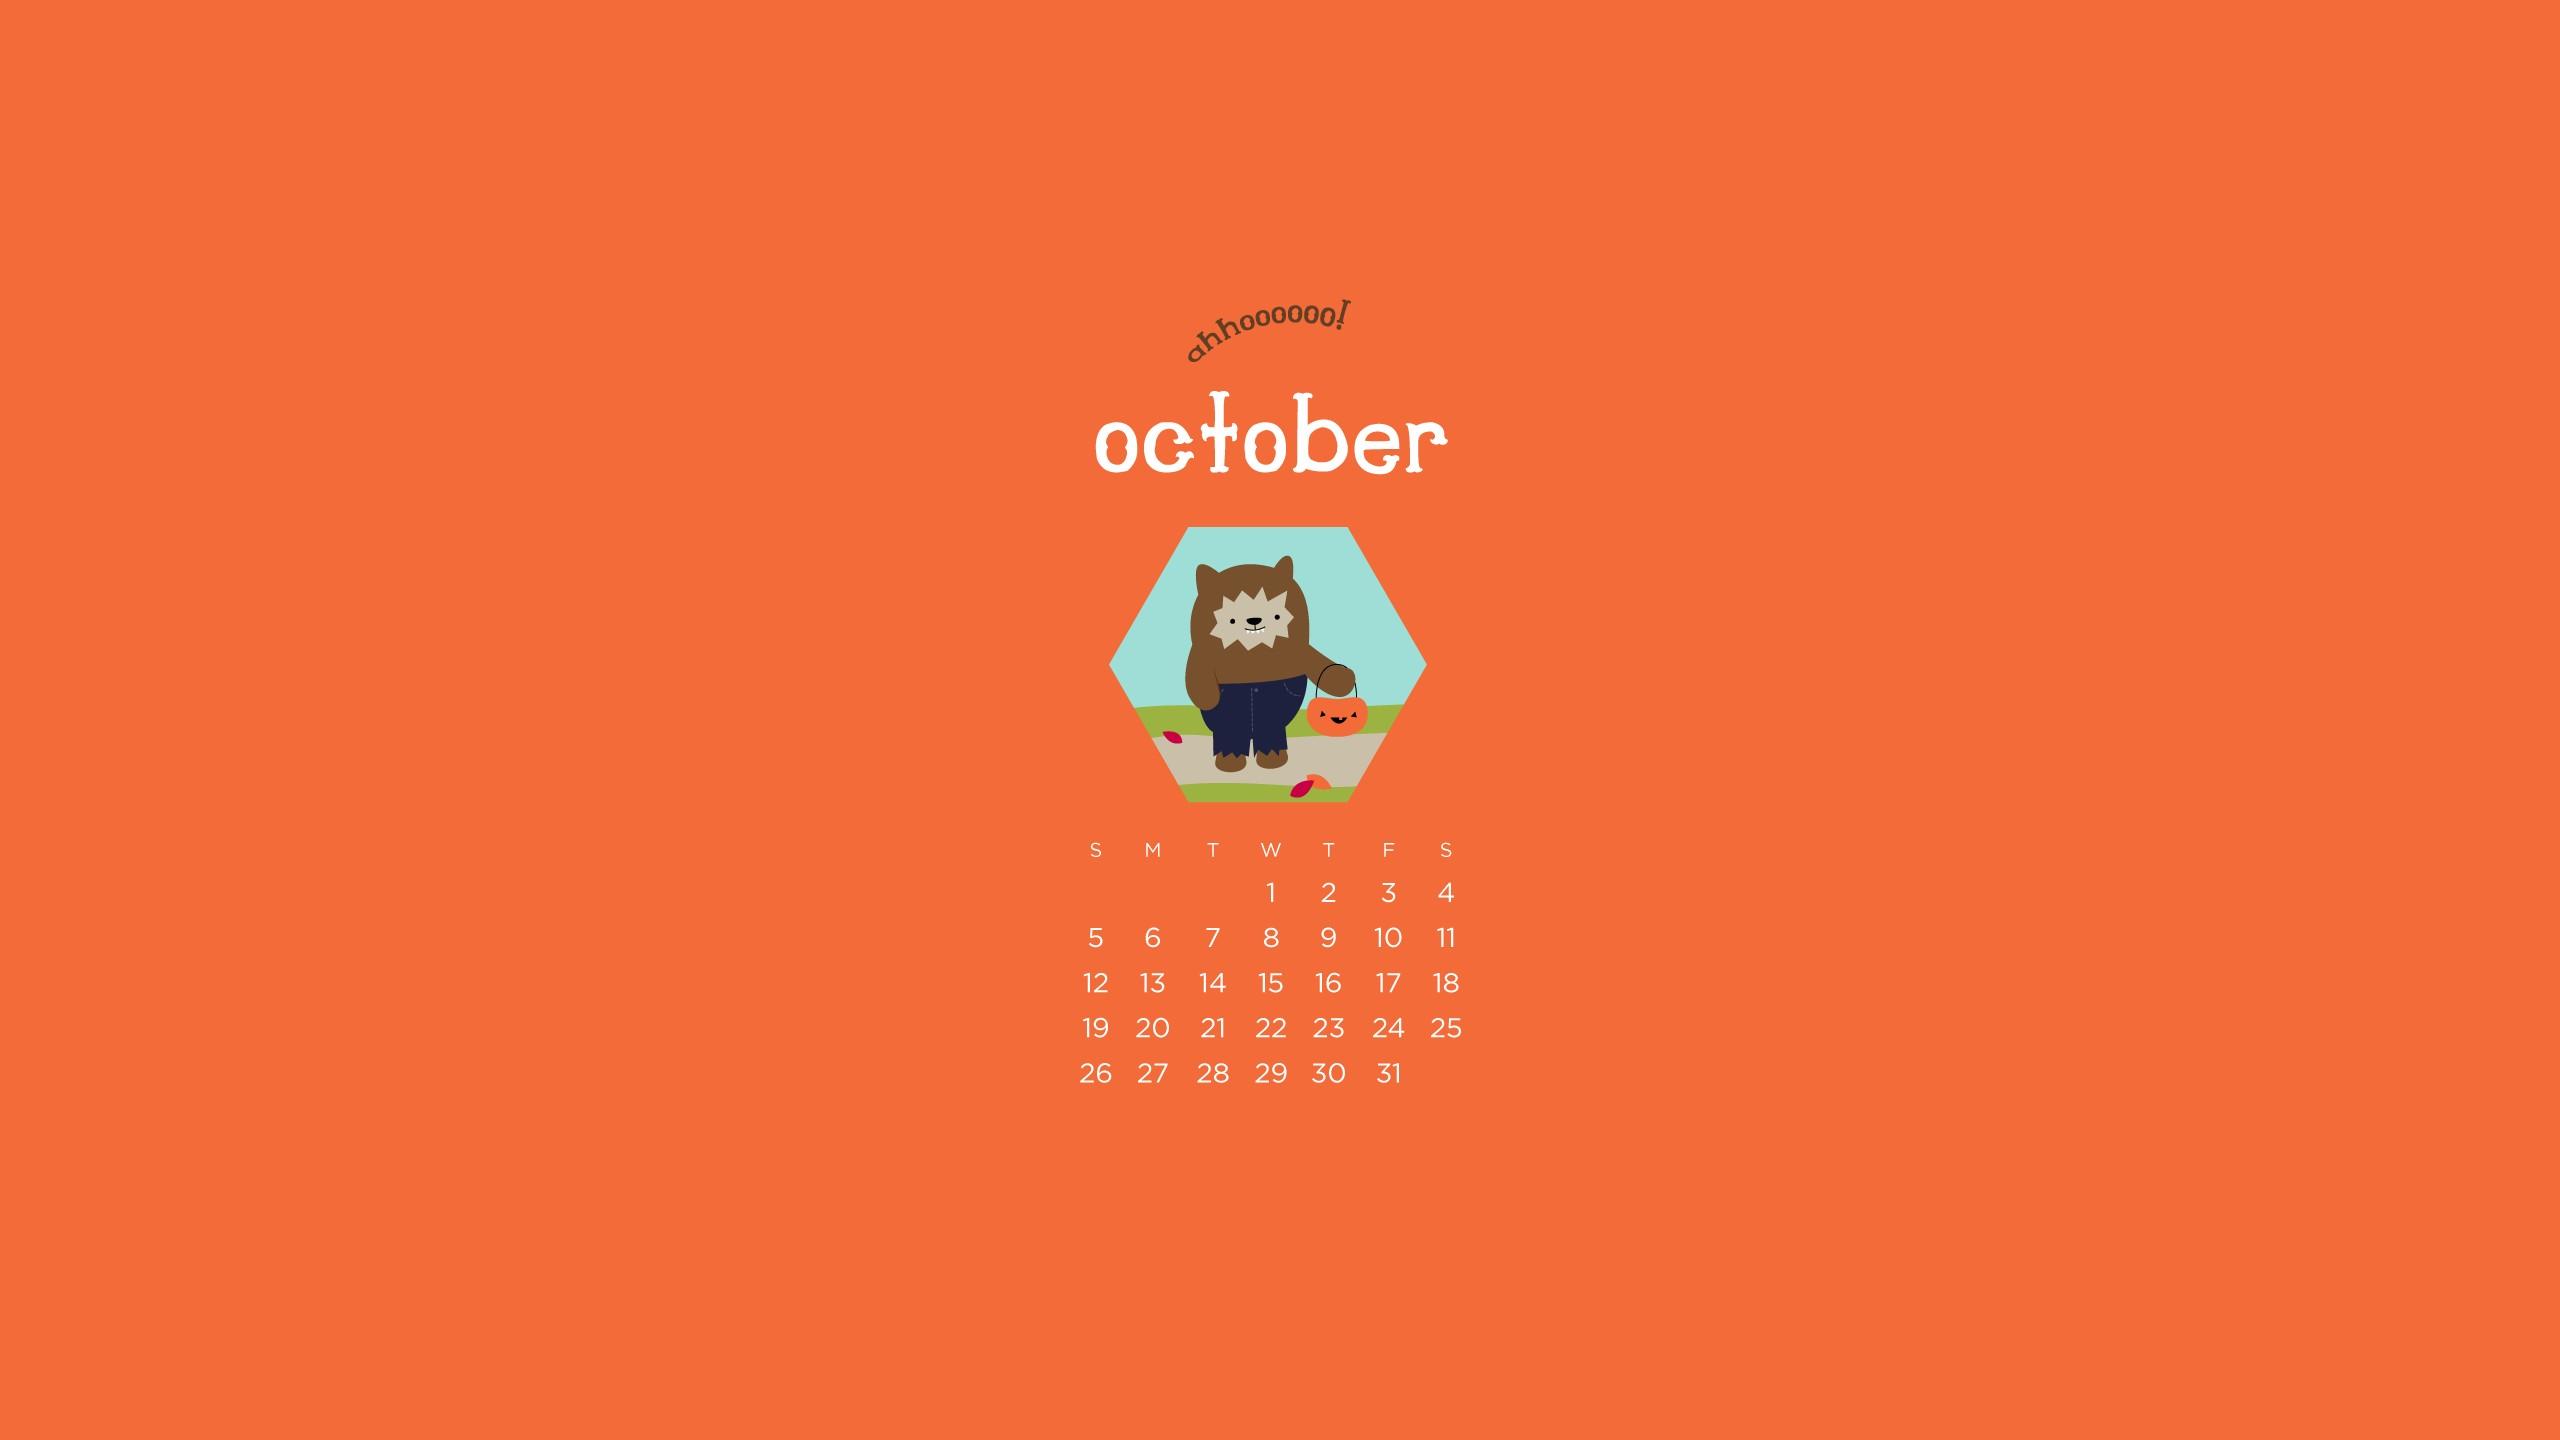 Calendar Wallpaper Ipad : October wallpaper ·① download free high resolution